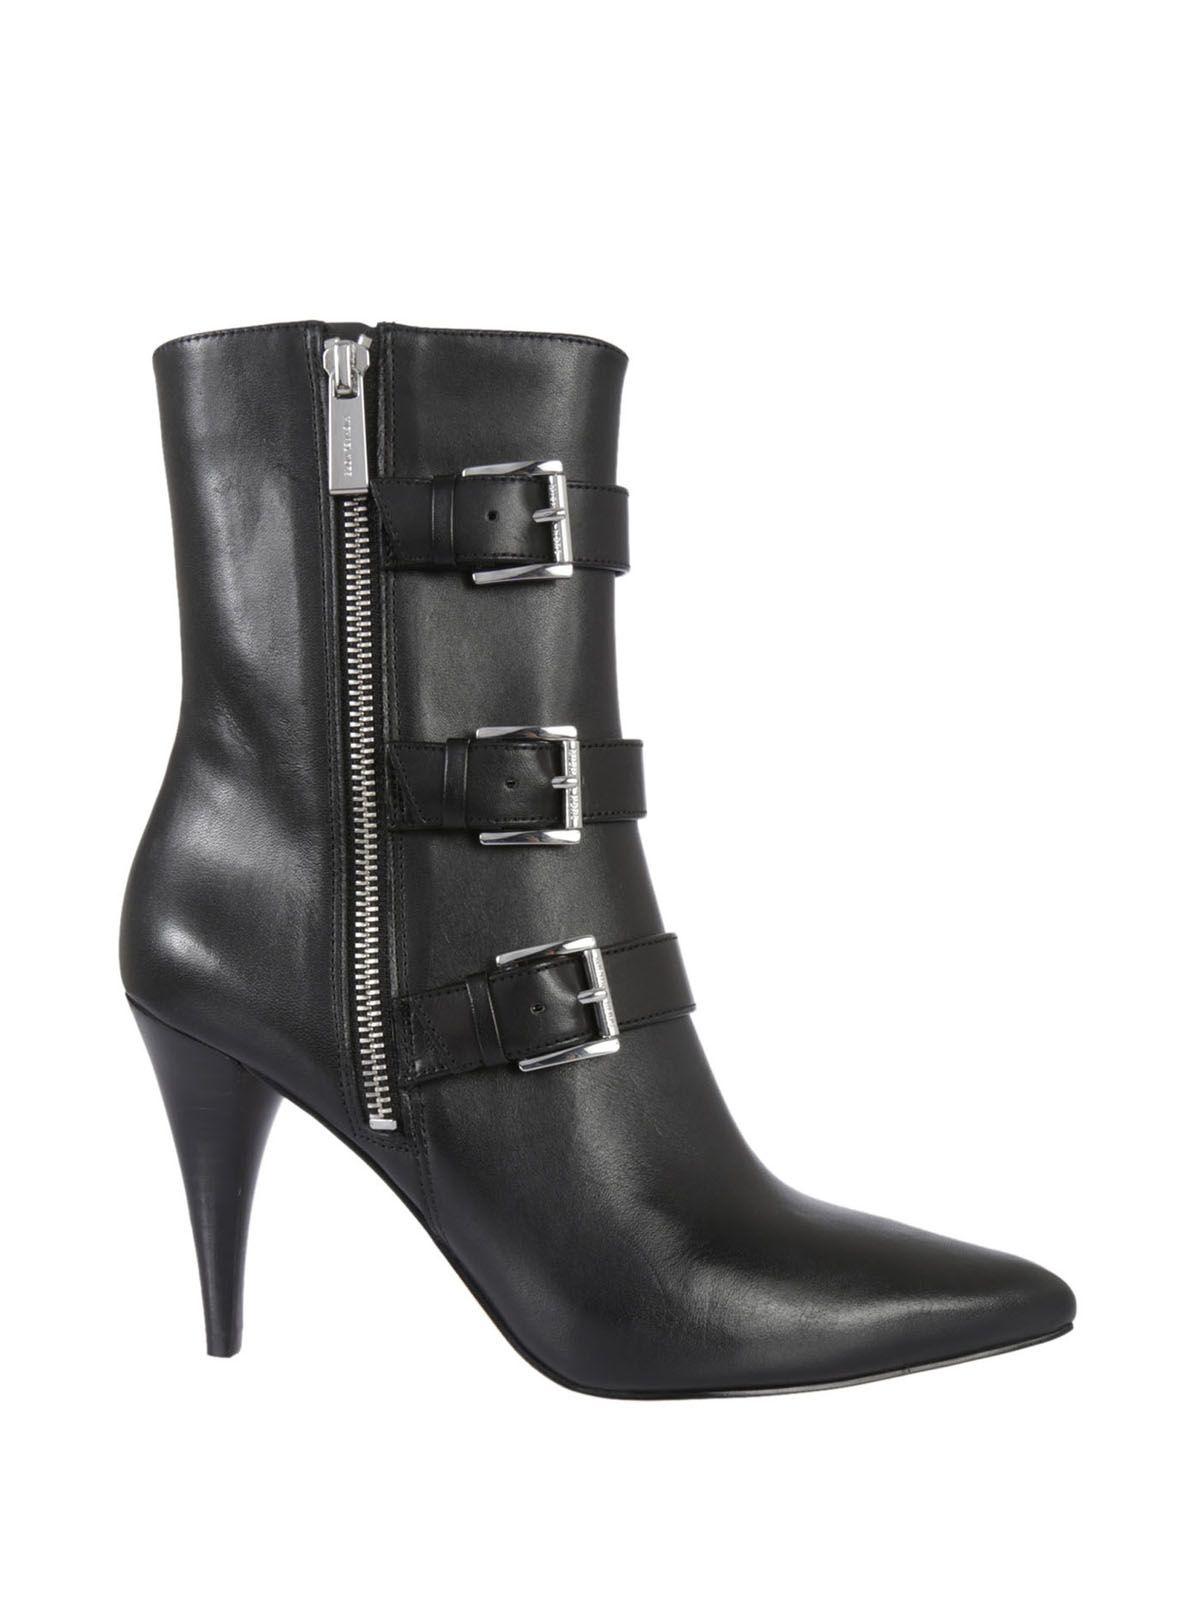 michael kors lori leather ankle boots black 9331131. Black Bedroom Furniture Sets. Home Design Ideas